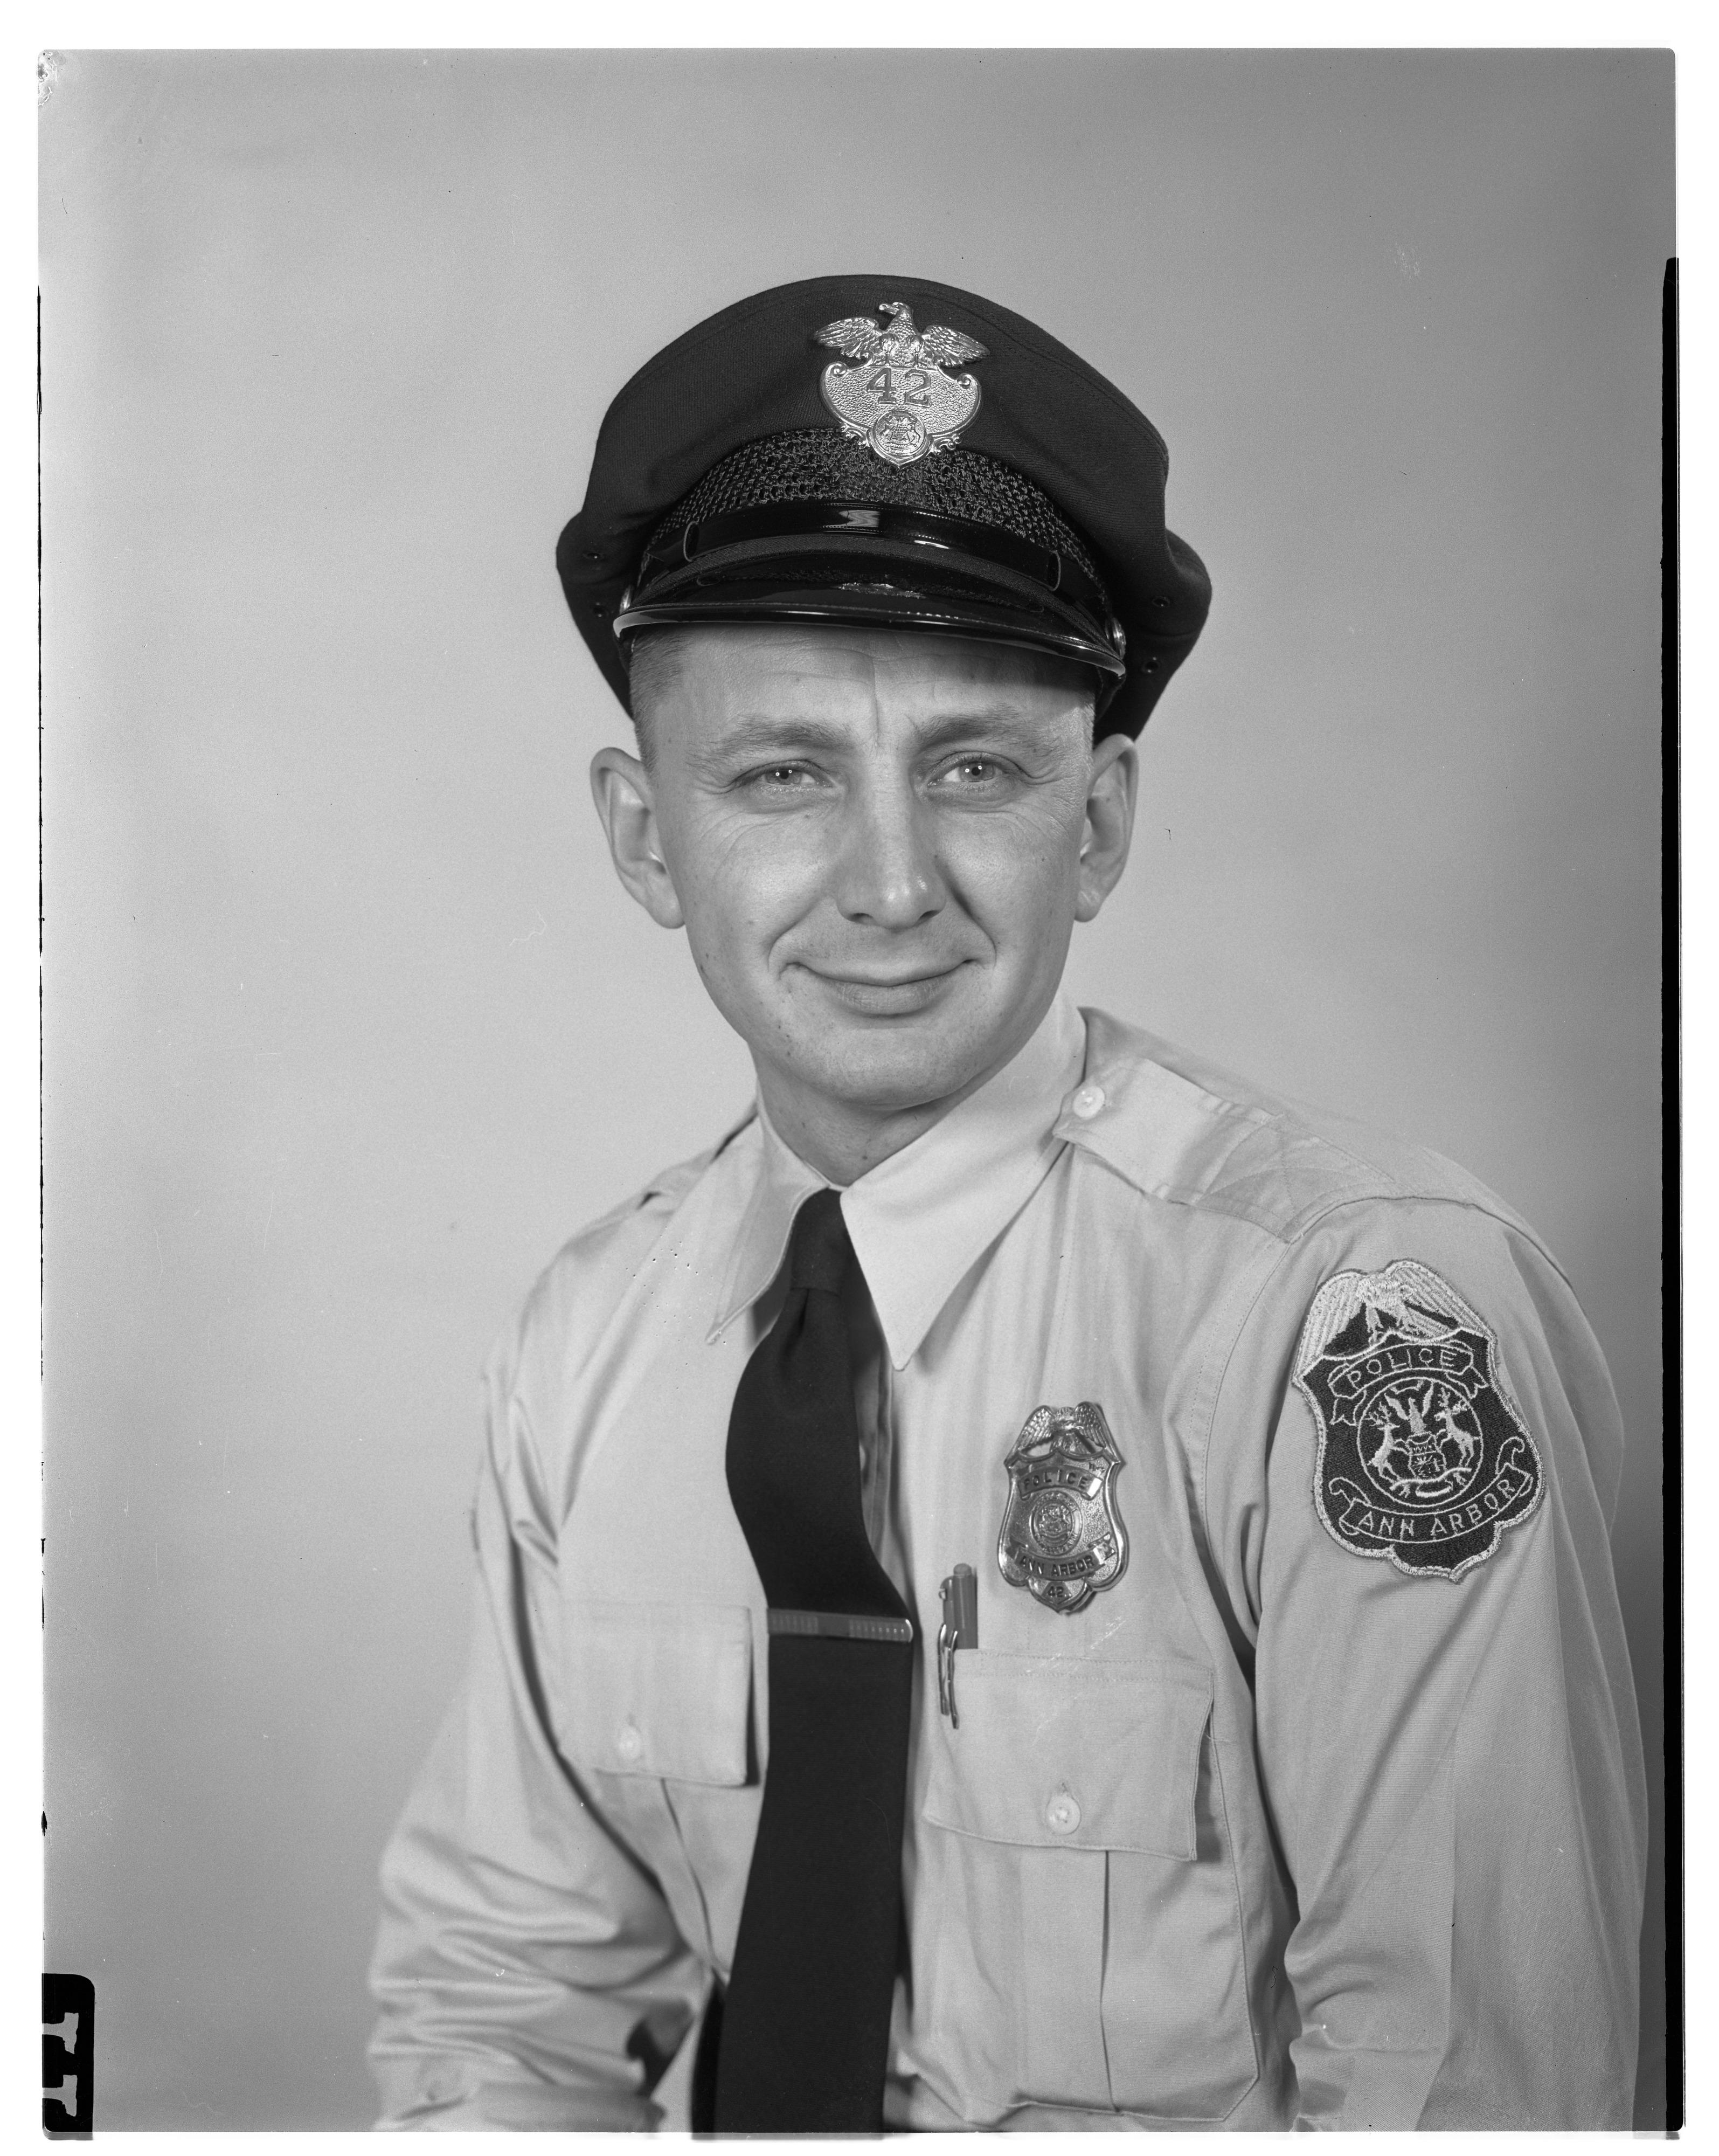 Patrolman Leonard William Alber   Ann Arbor Police Department, Michigan